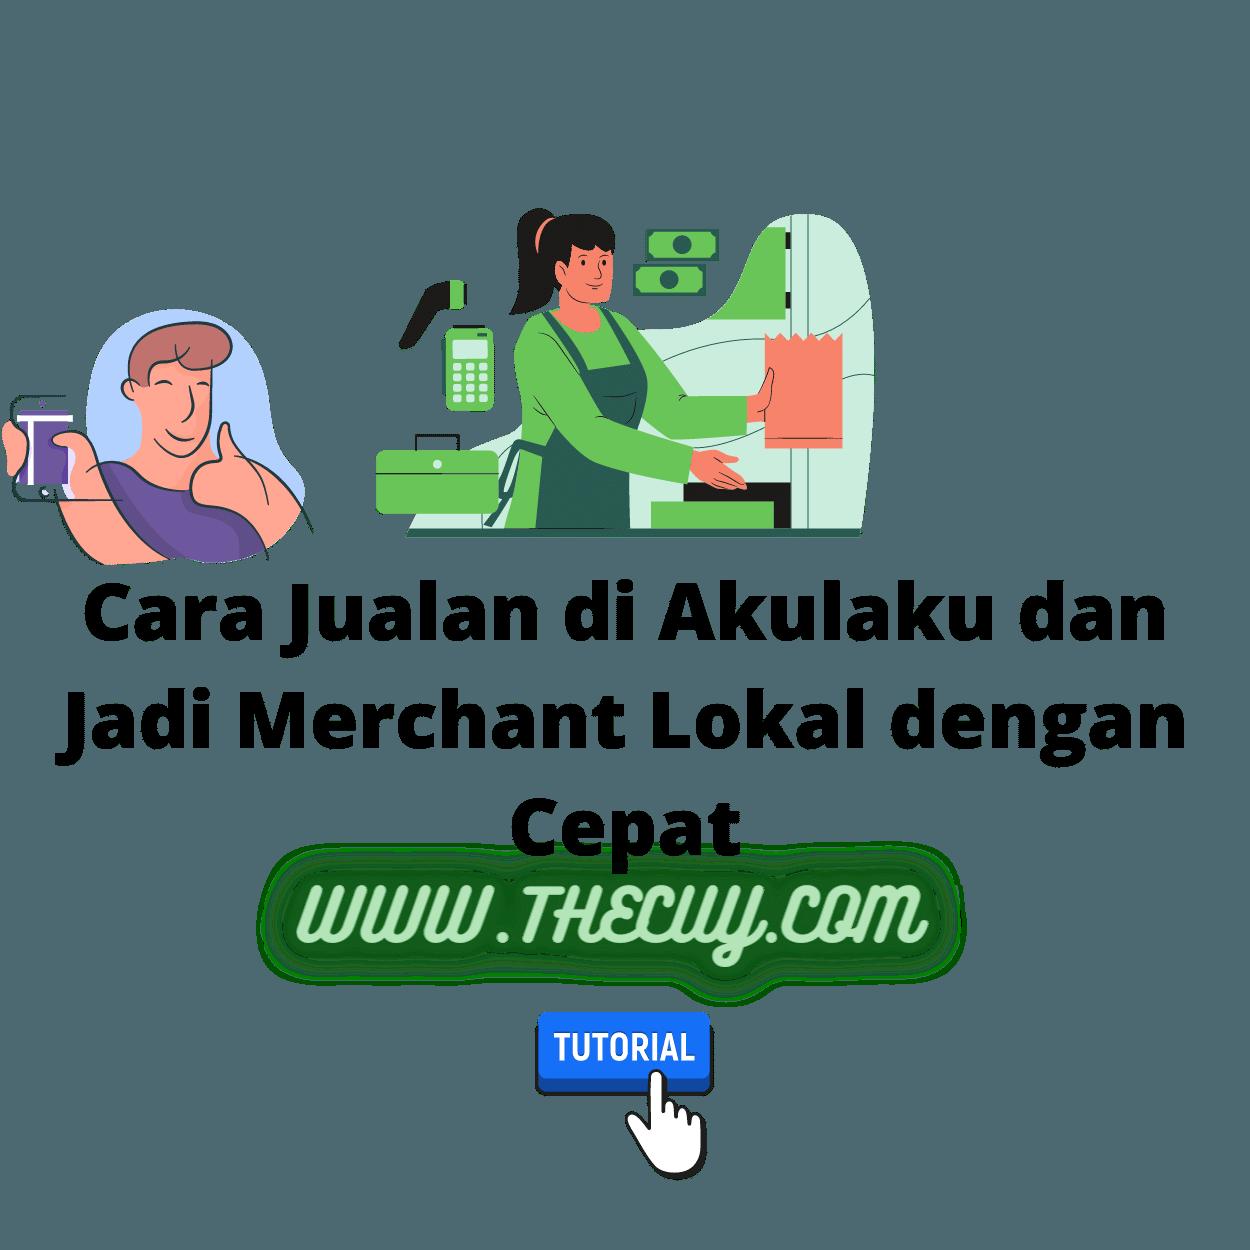 Cara Jualan di Akulaku dan Jadi Merchant Lokal dengan Cepat